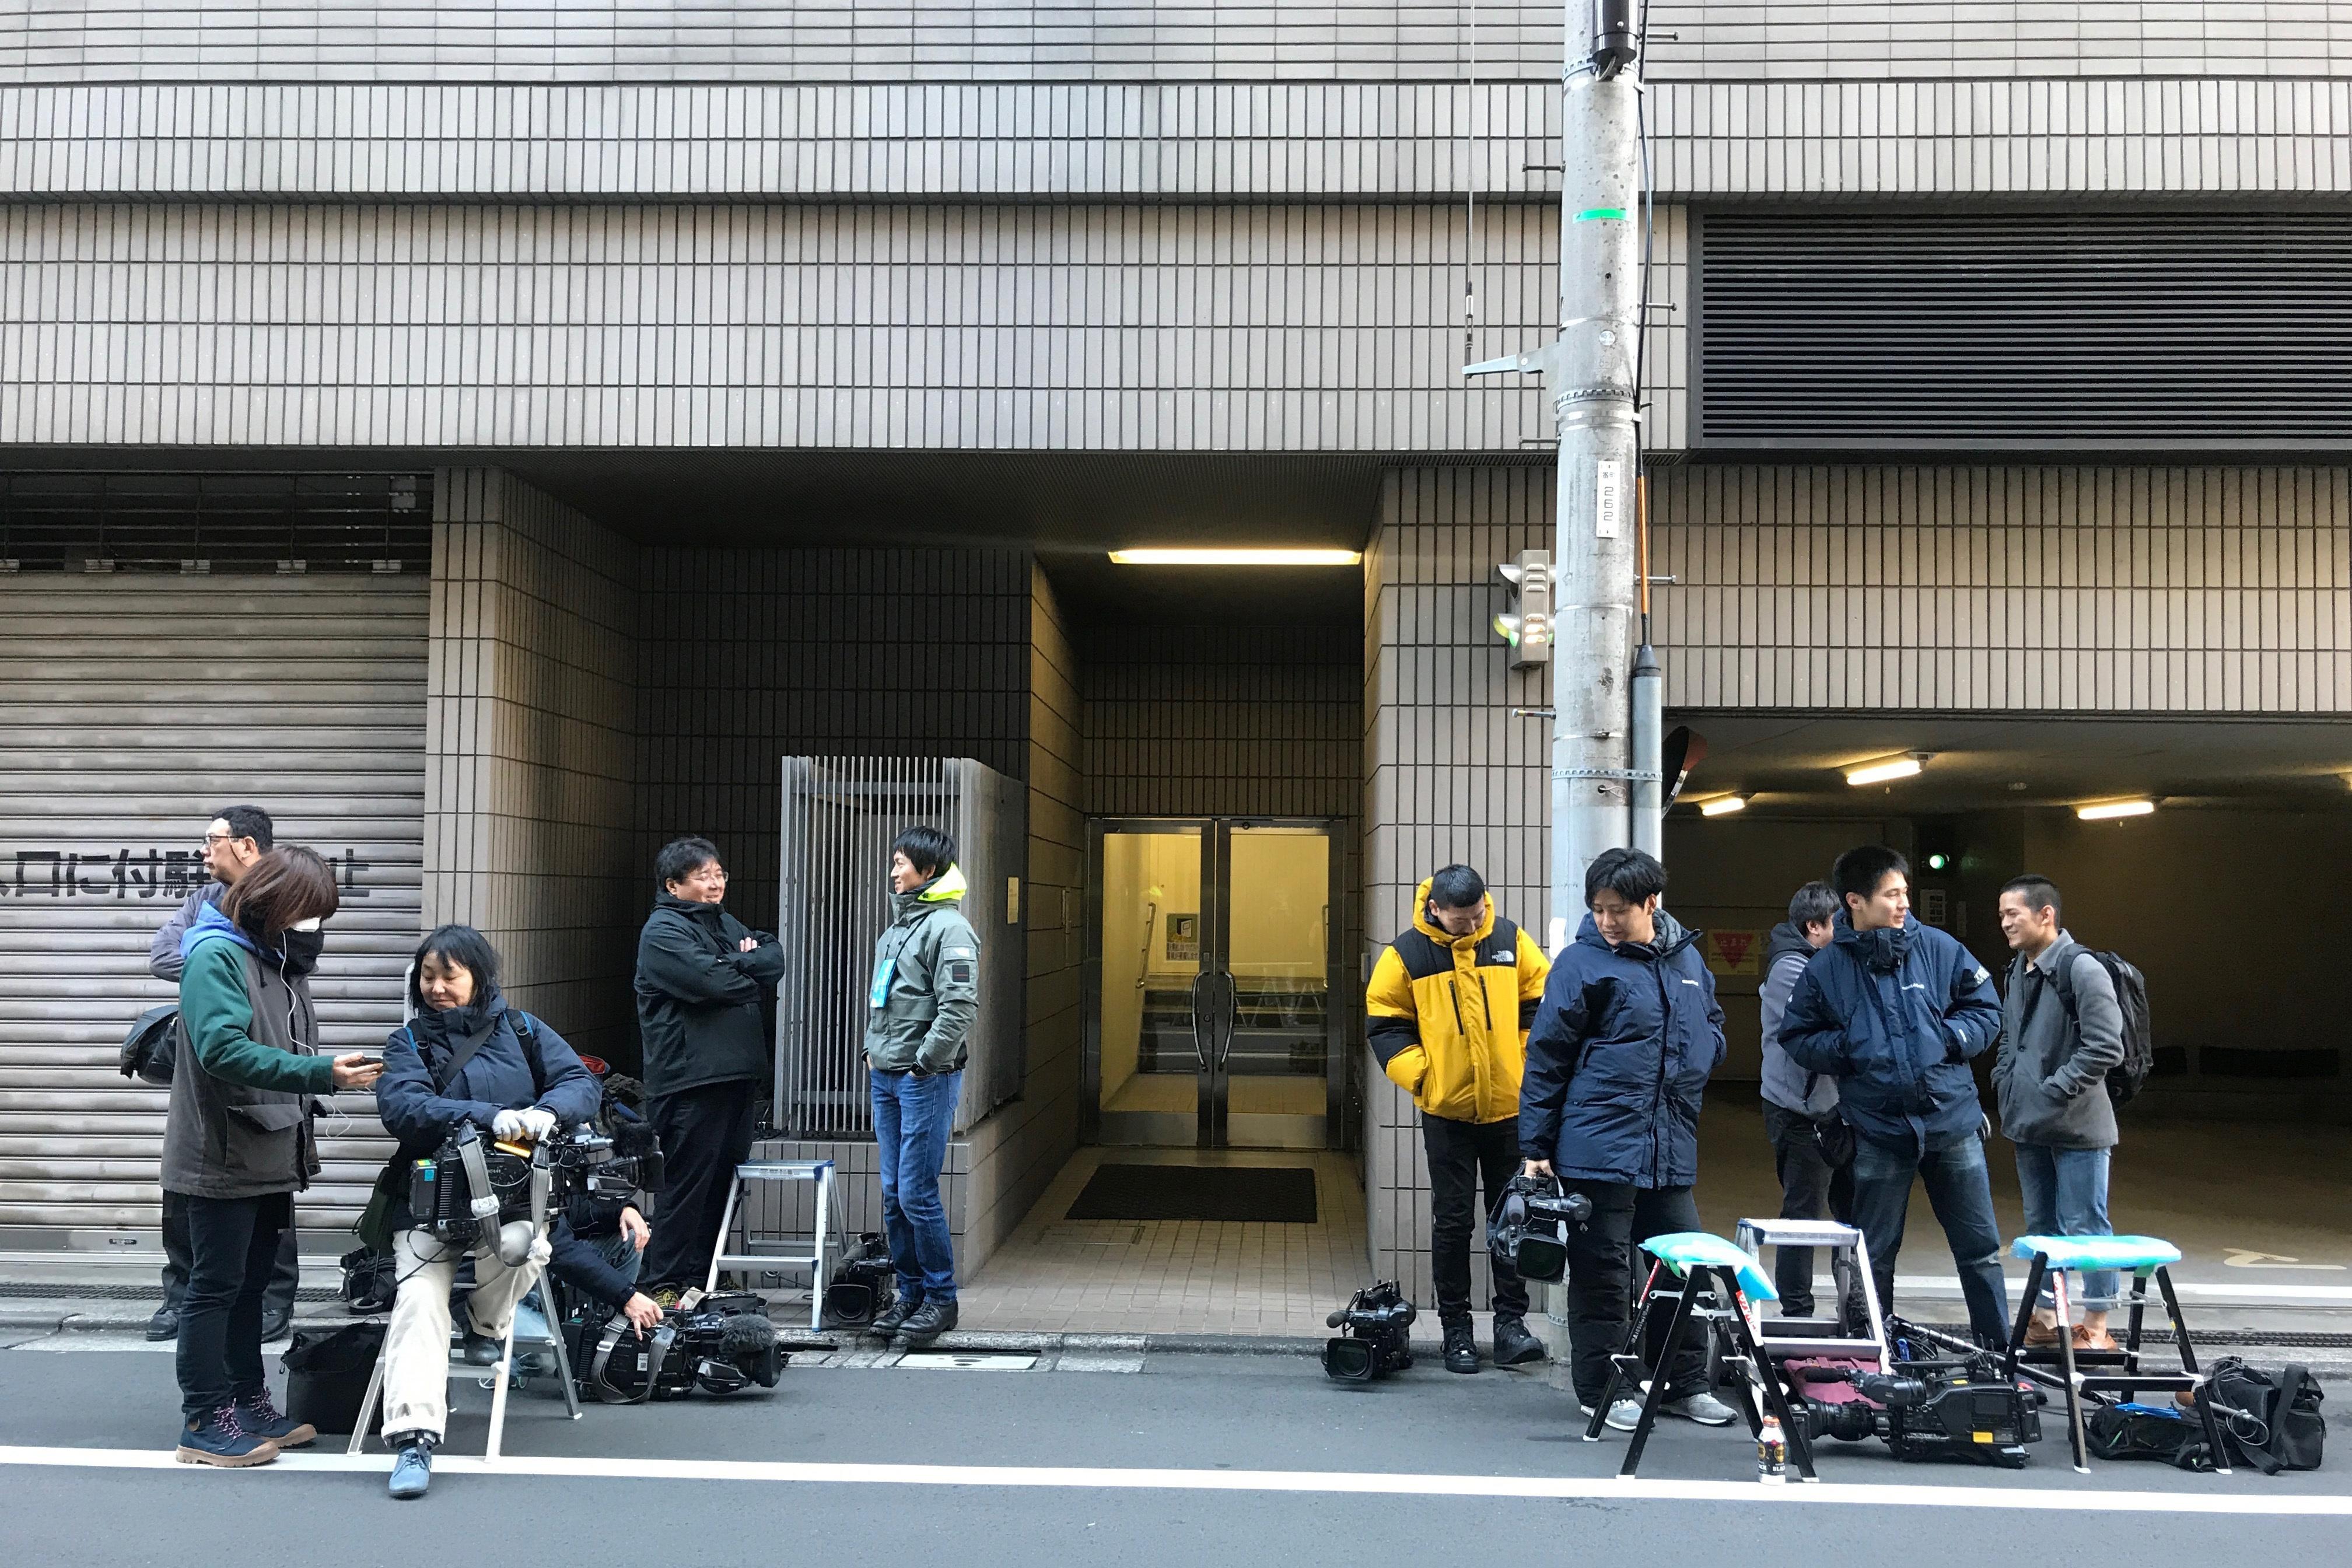 A daring escape: Ex-Nissan chief flees Japan ahead of trial